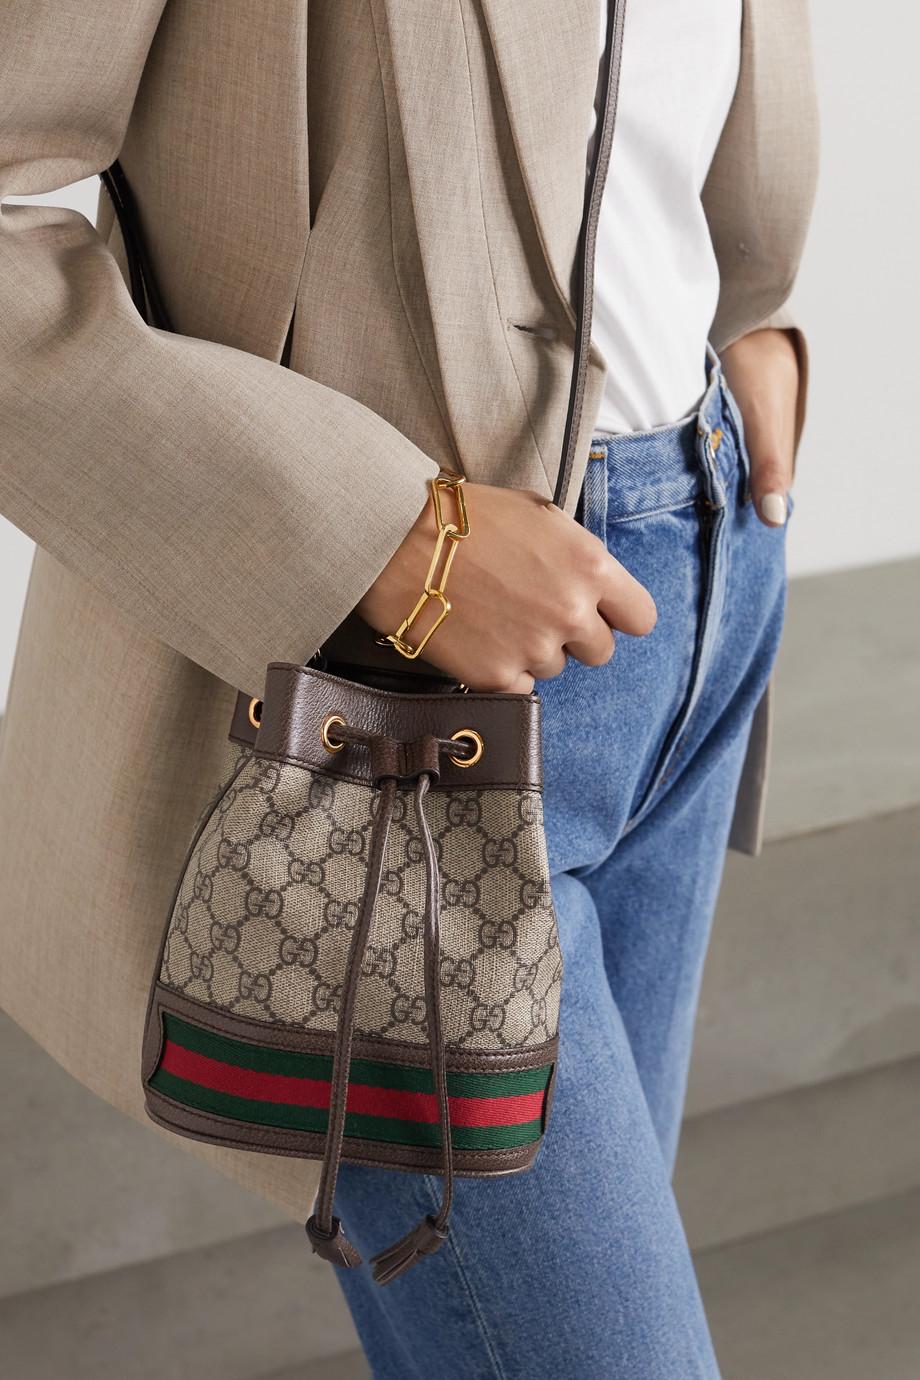 Gucci Ophidia 纹理皮革边饰印花涂层帆布迷你水桶包